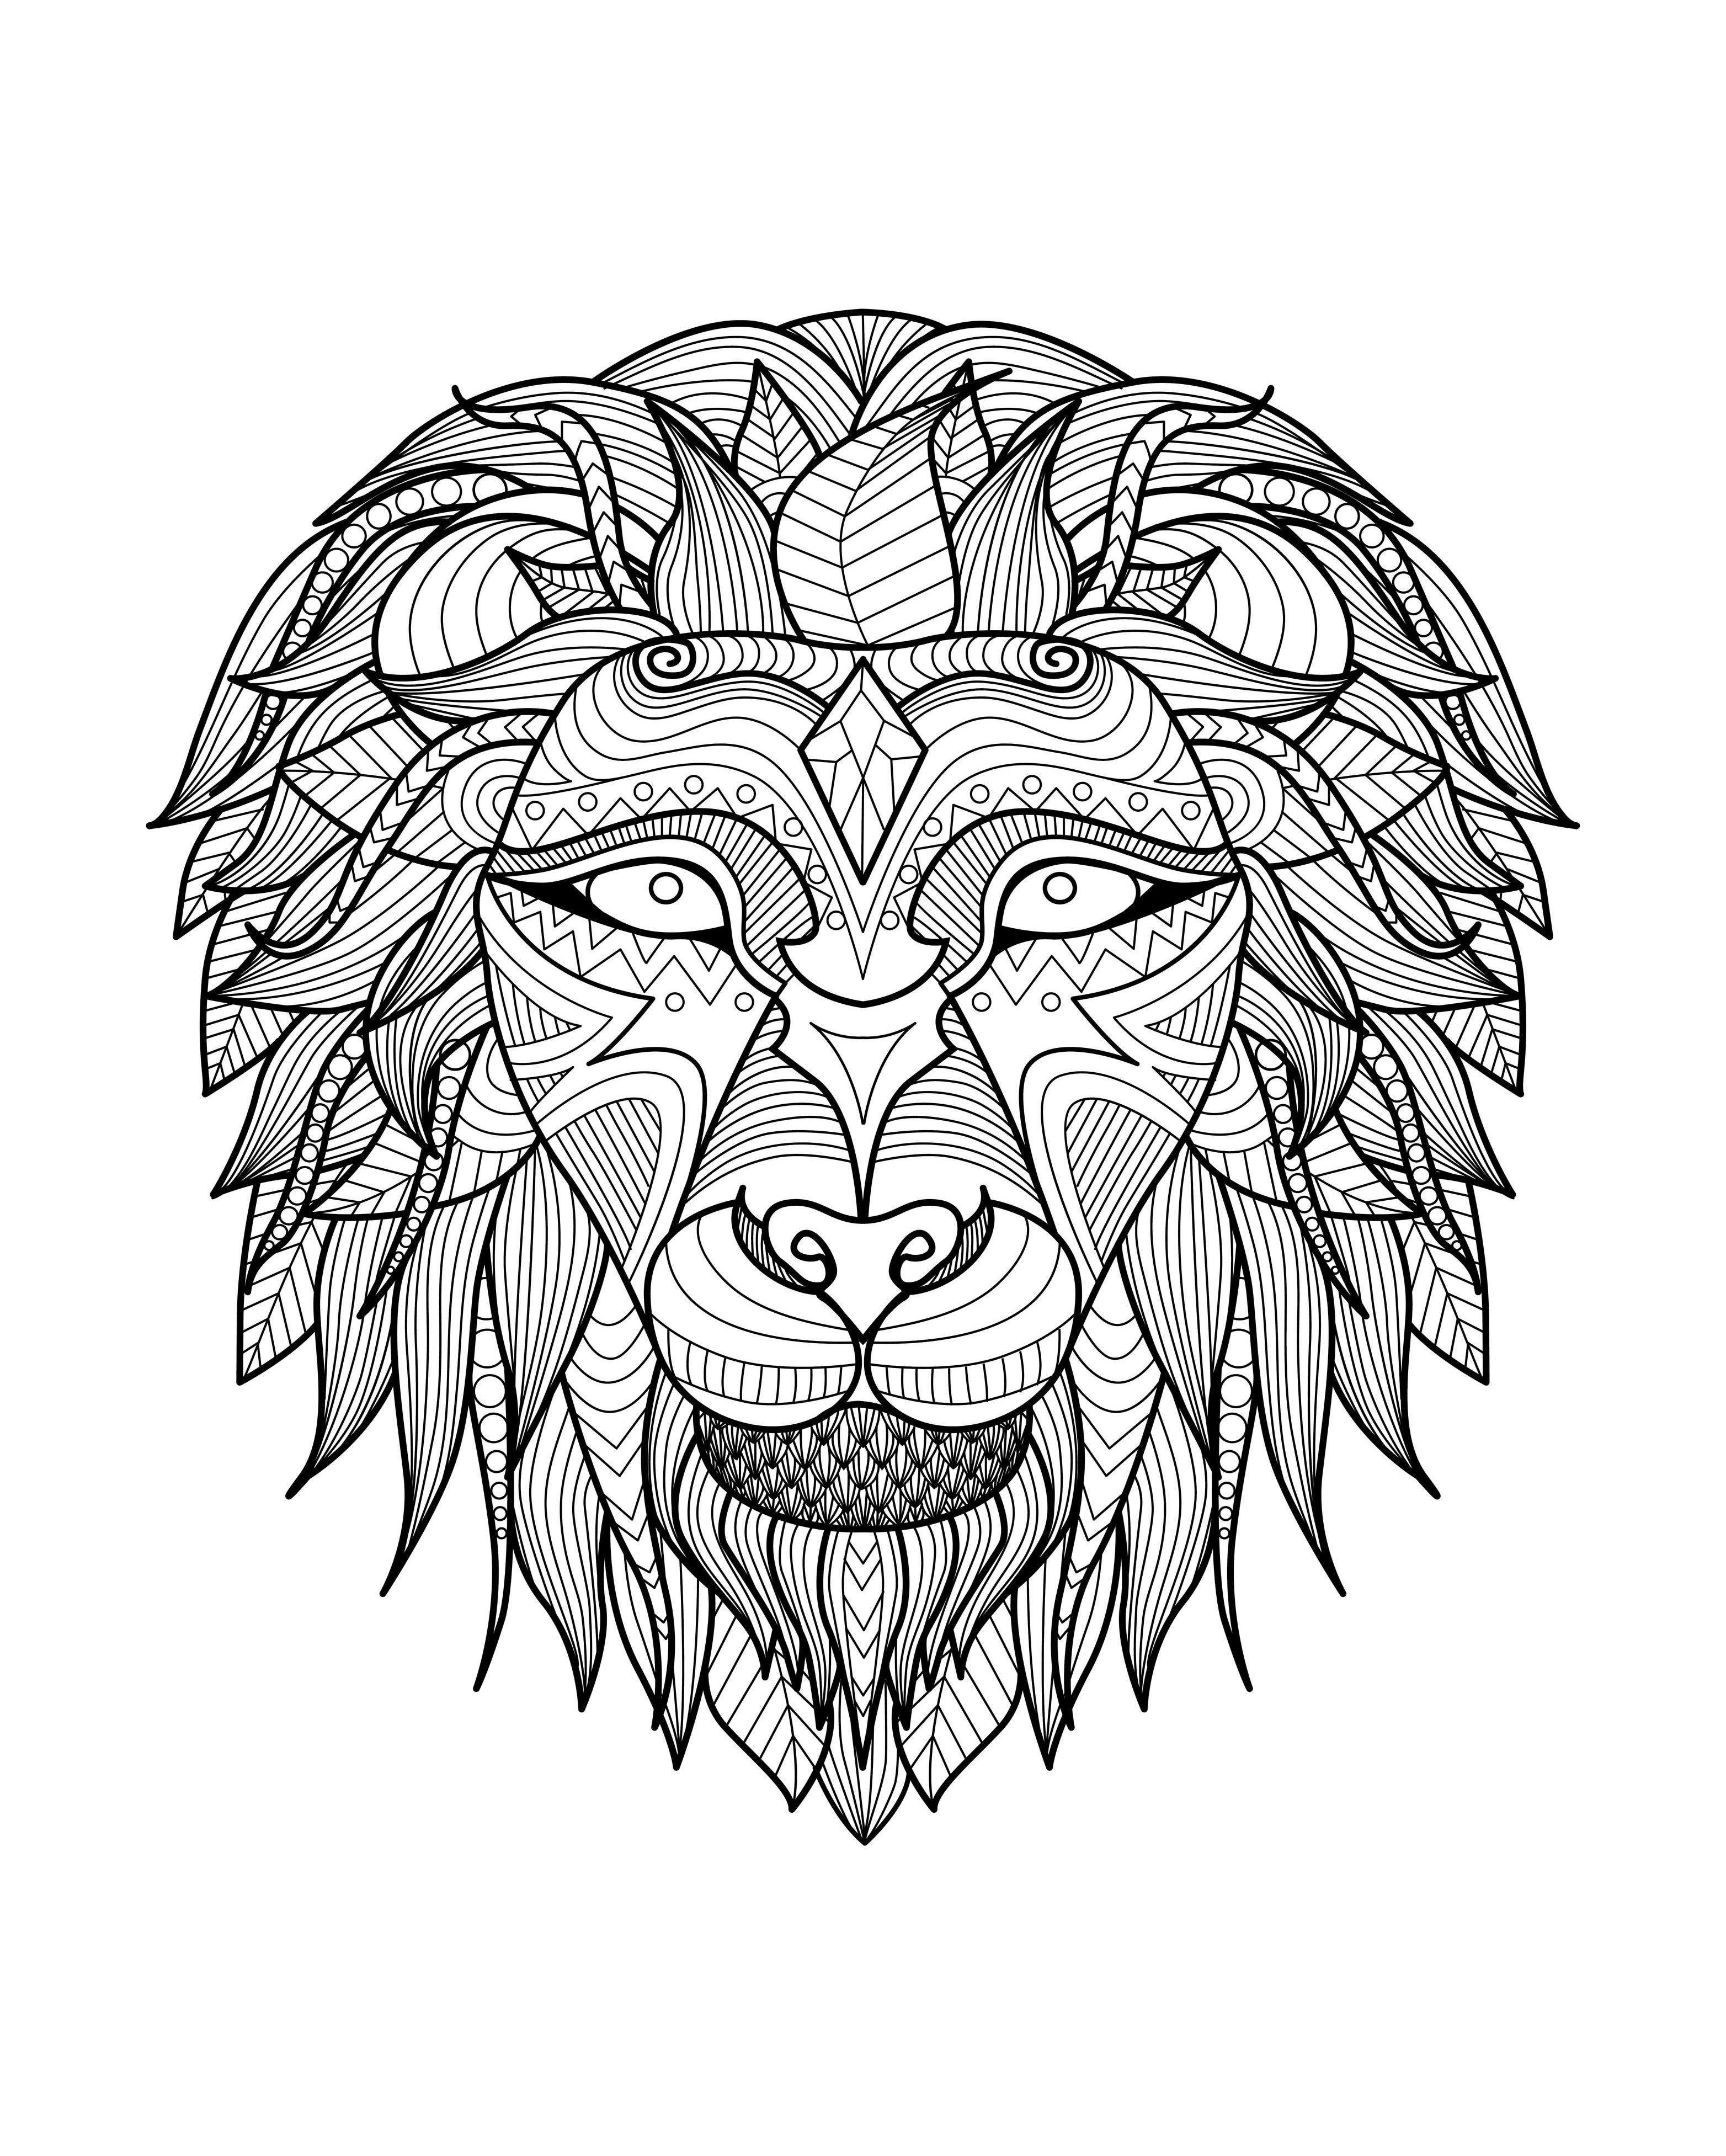 coloriage anti stress tete de lion. Black Bedroom Furniture Sets. Home Design Ideas